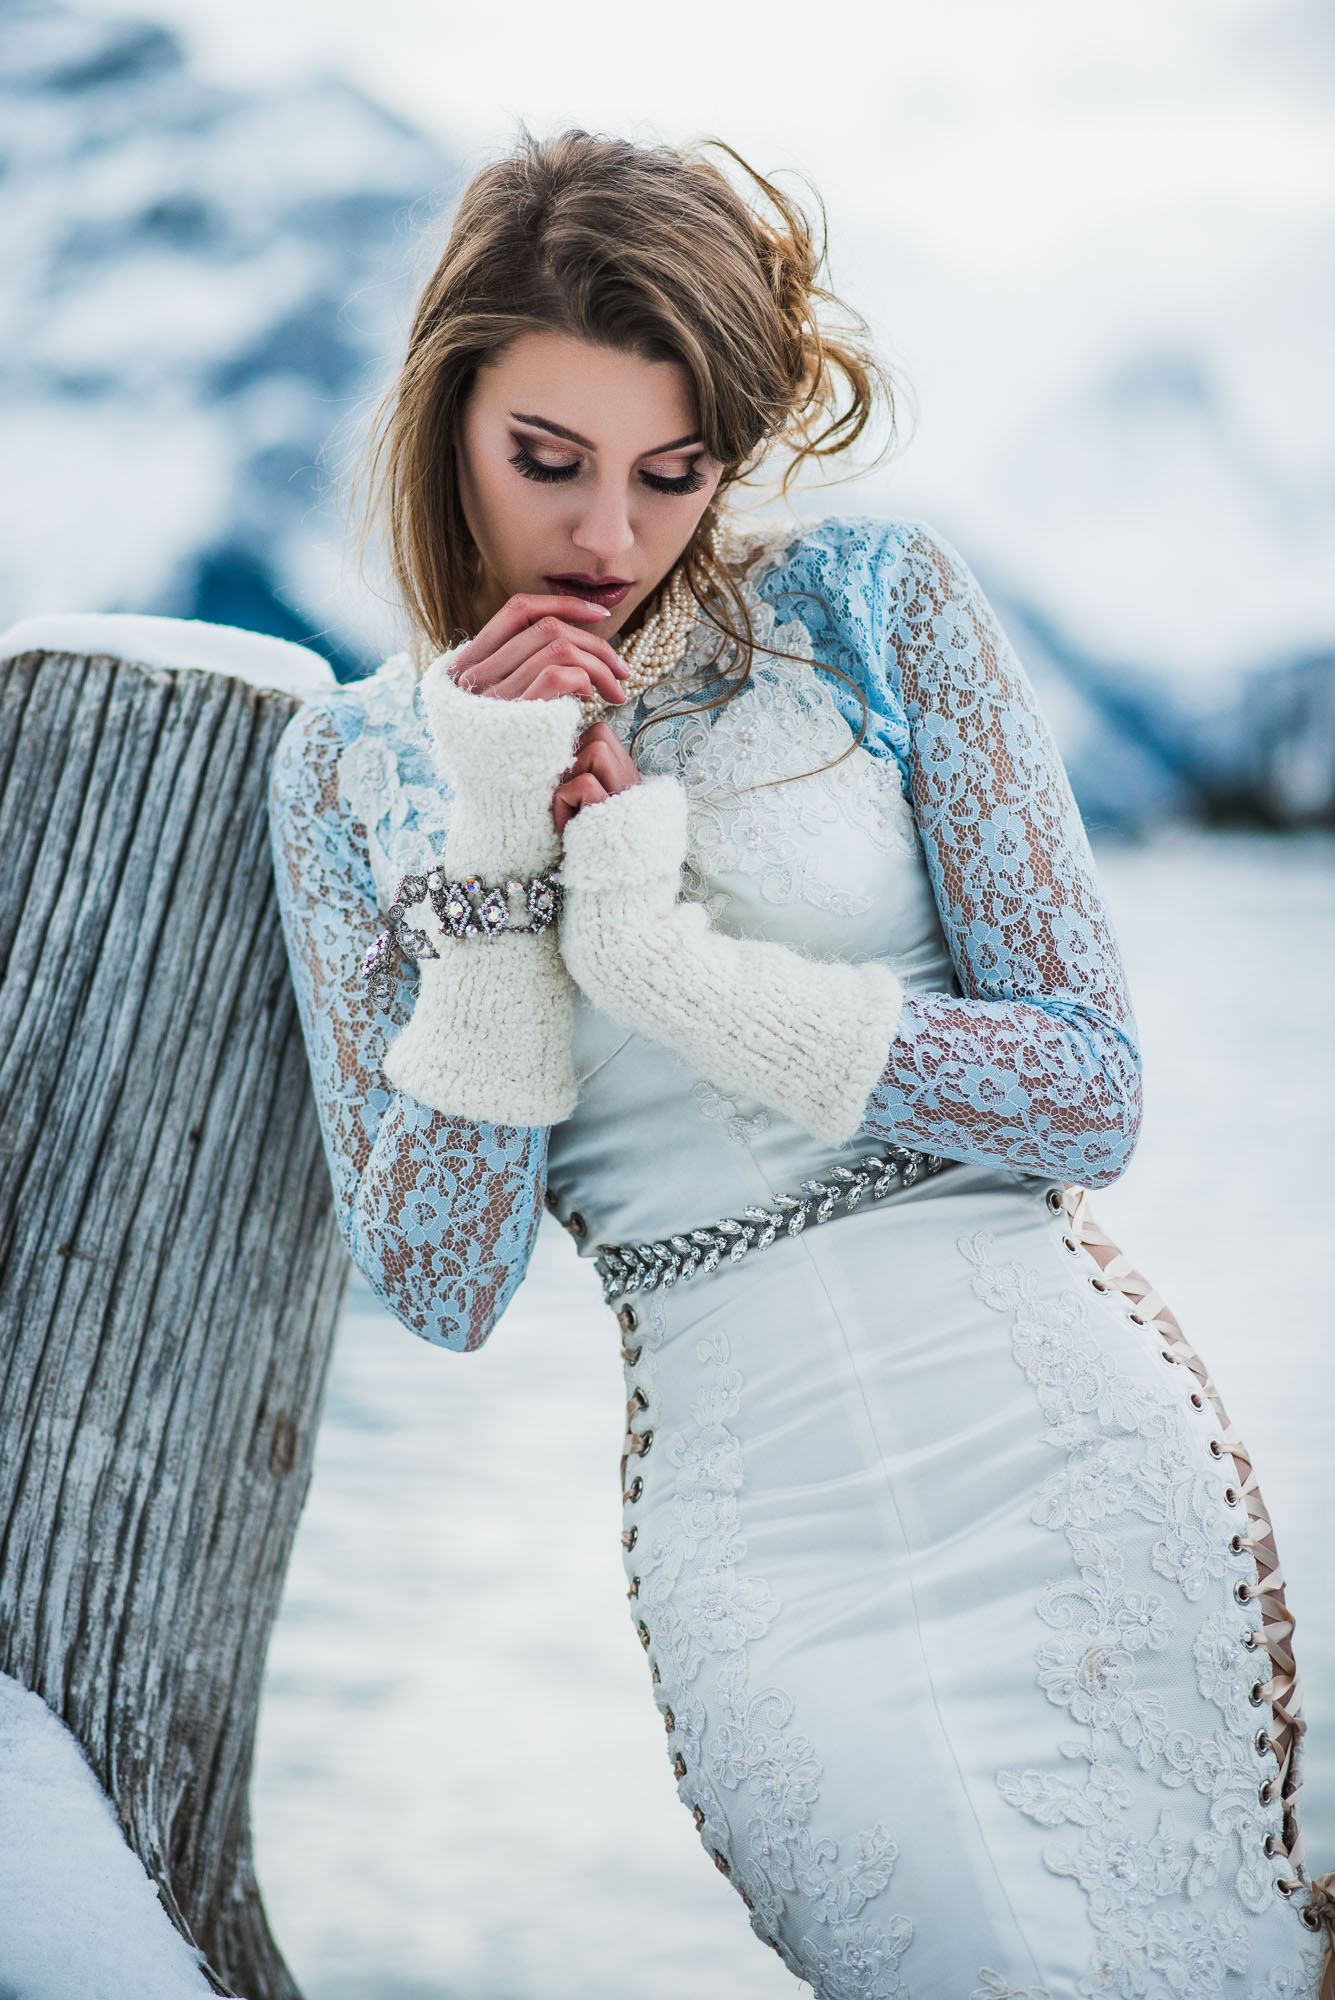 Kananaskis-Winter-Fashion -019.jpg